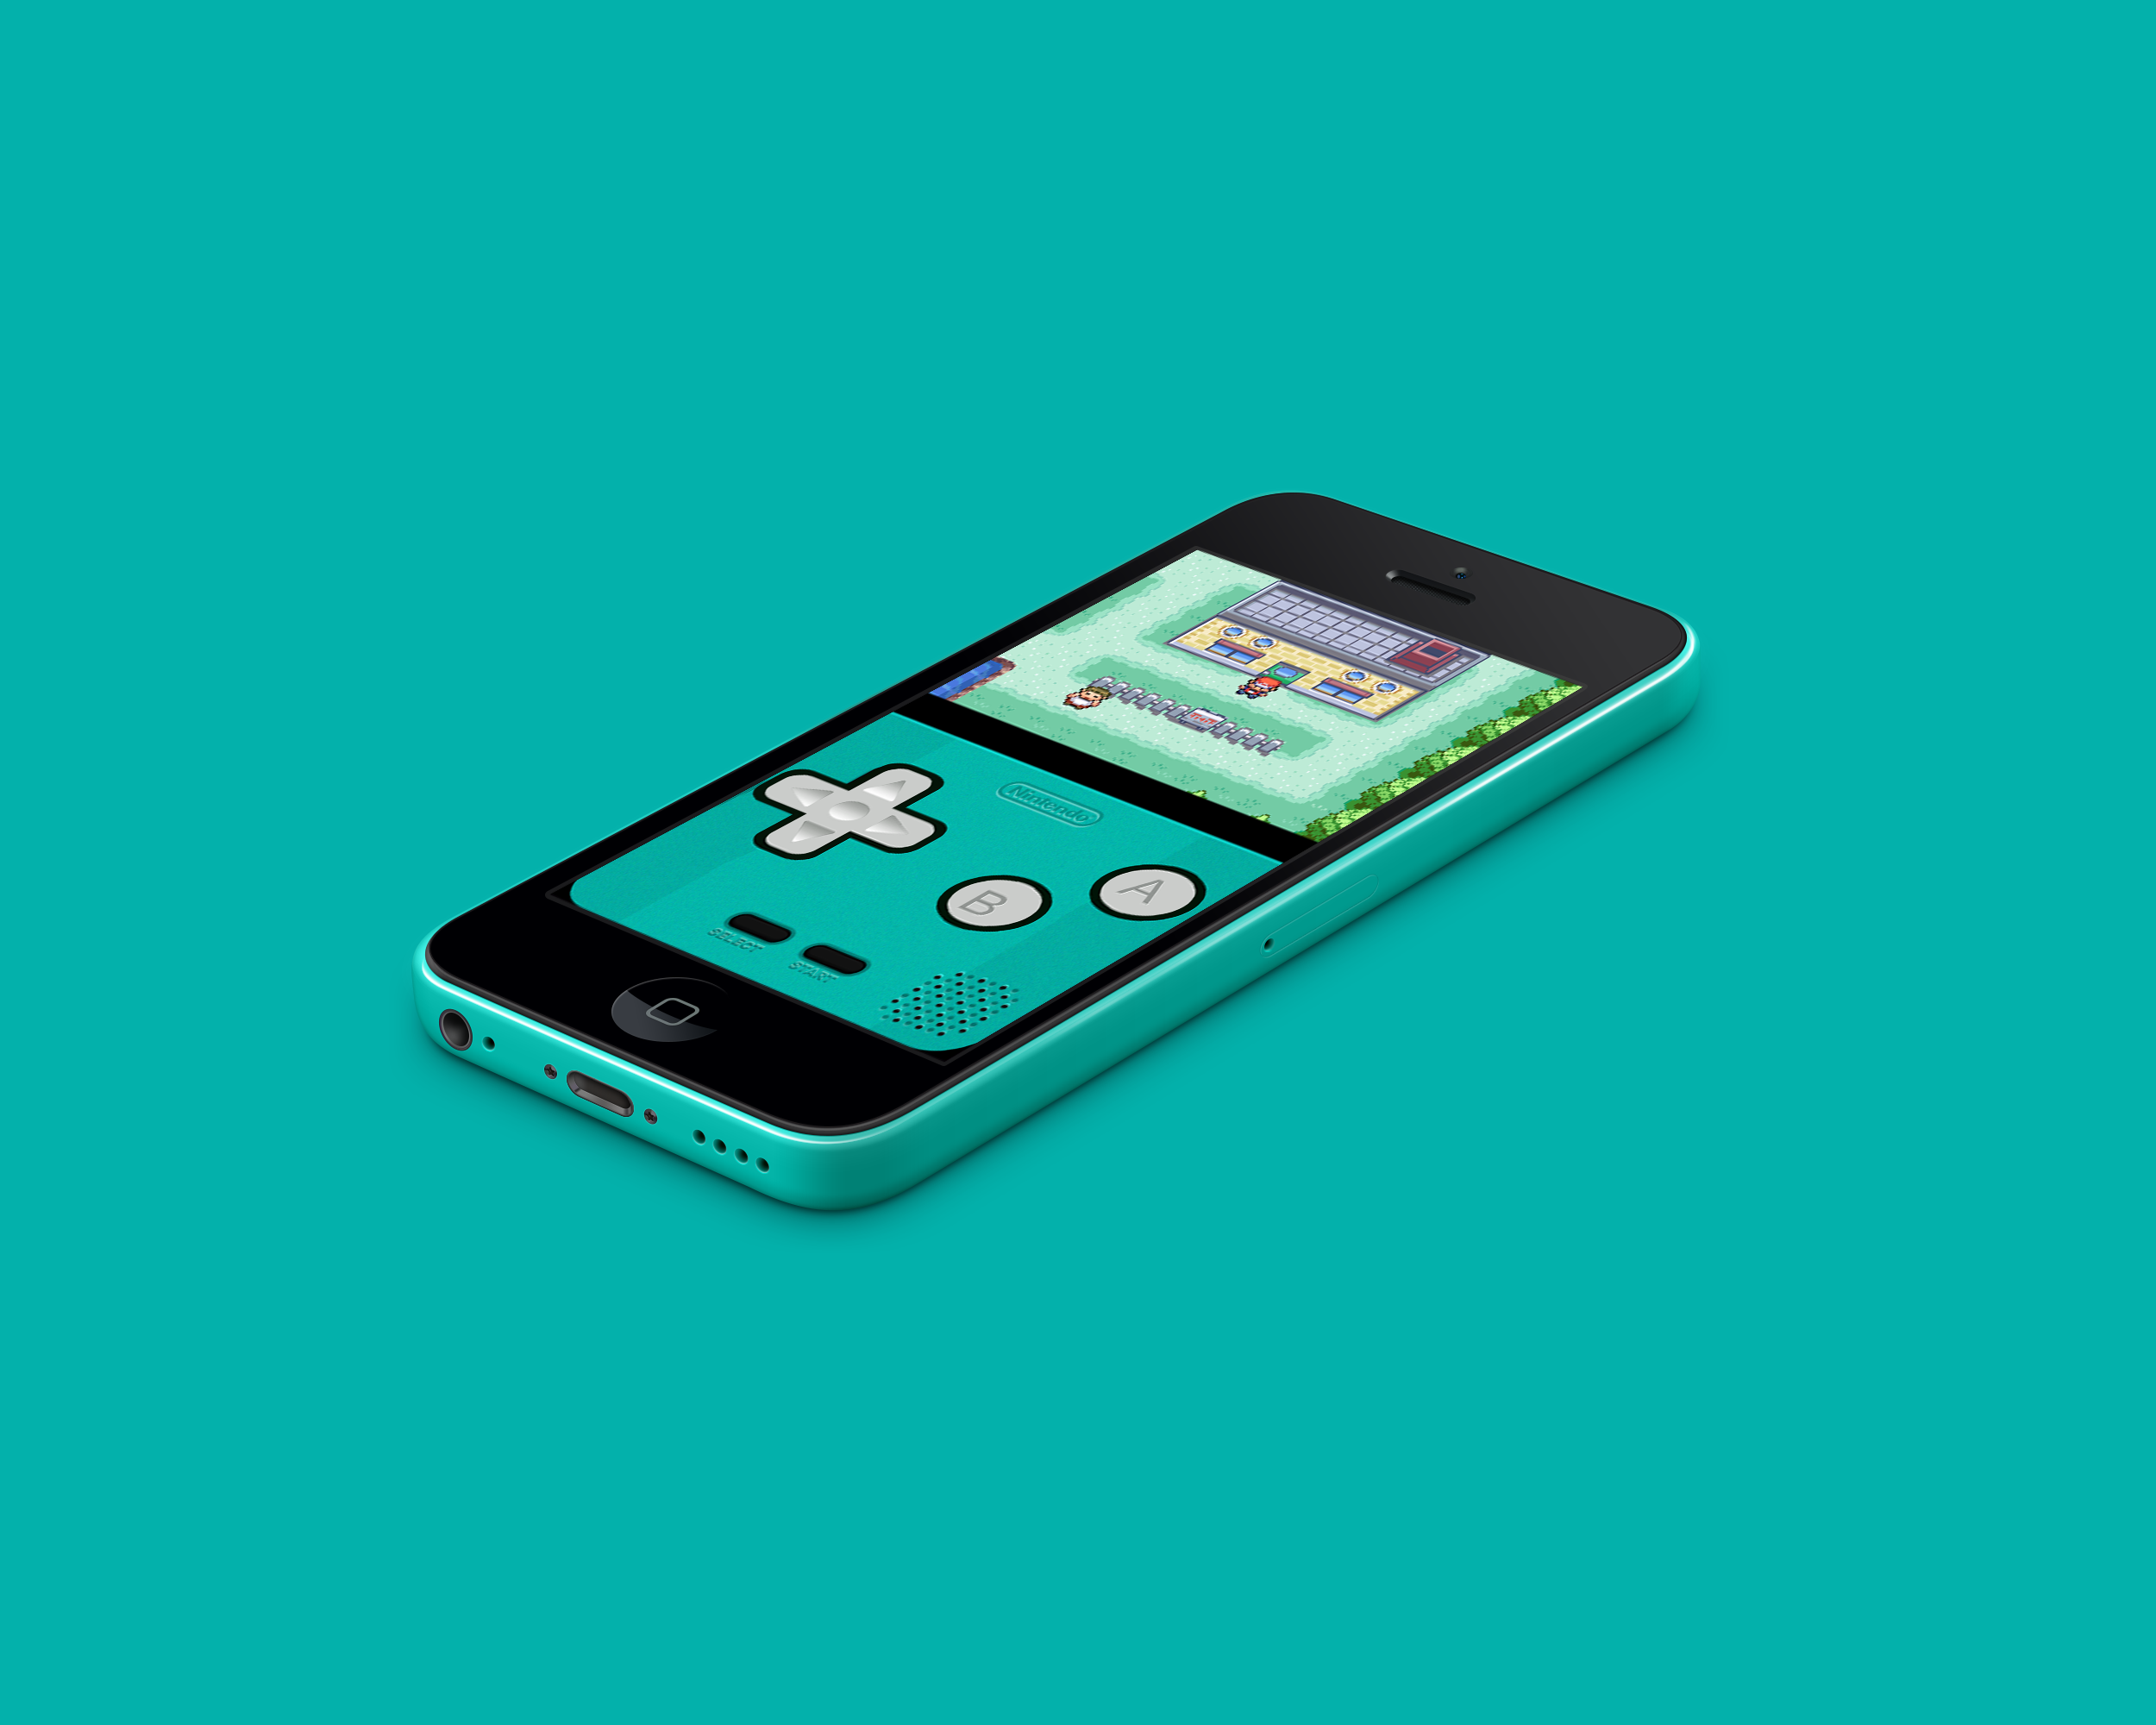 Good Wallpapers For Iphone 5c: IPhone 5c GBA Teal By Vitalovitalo On DeviantArt